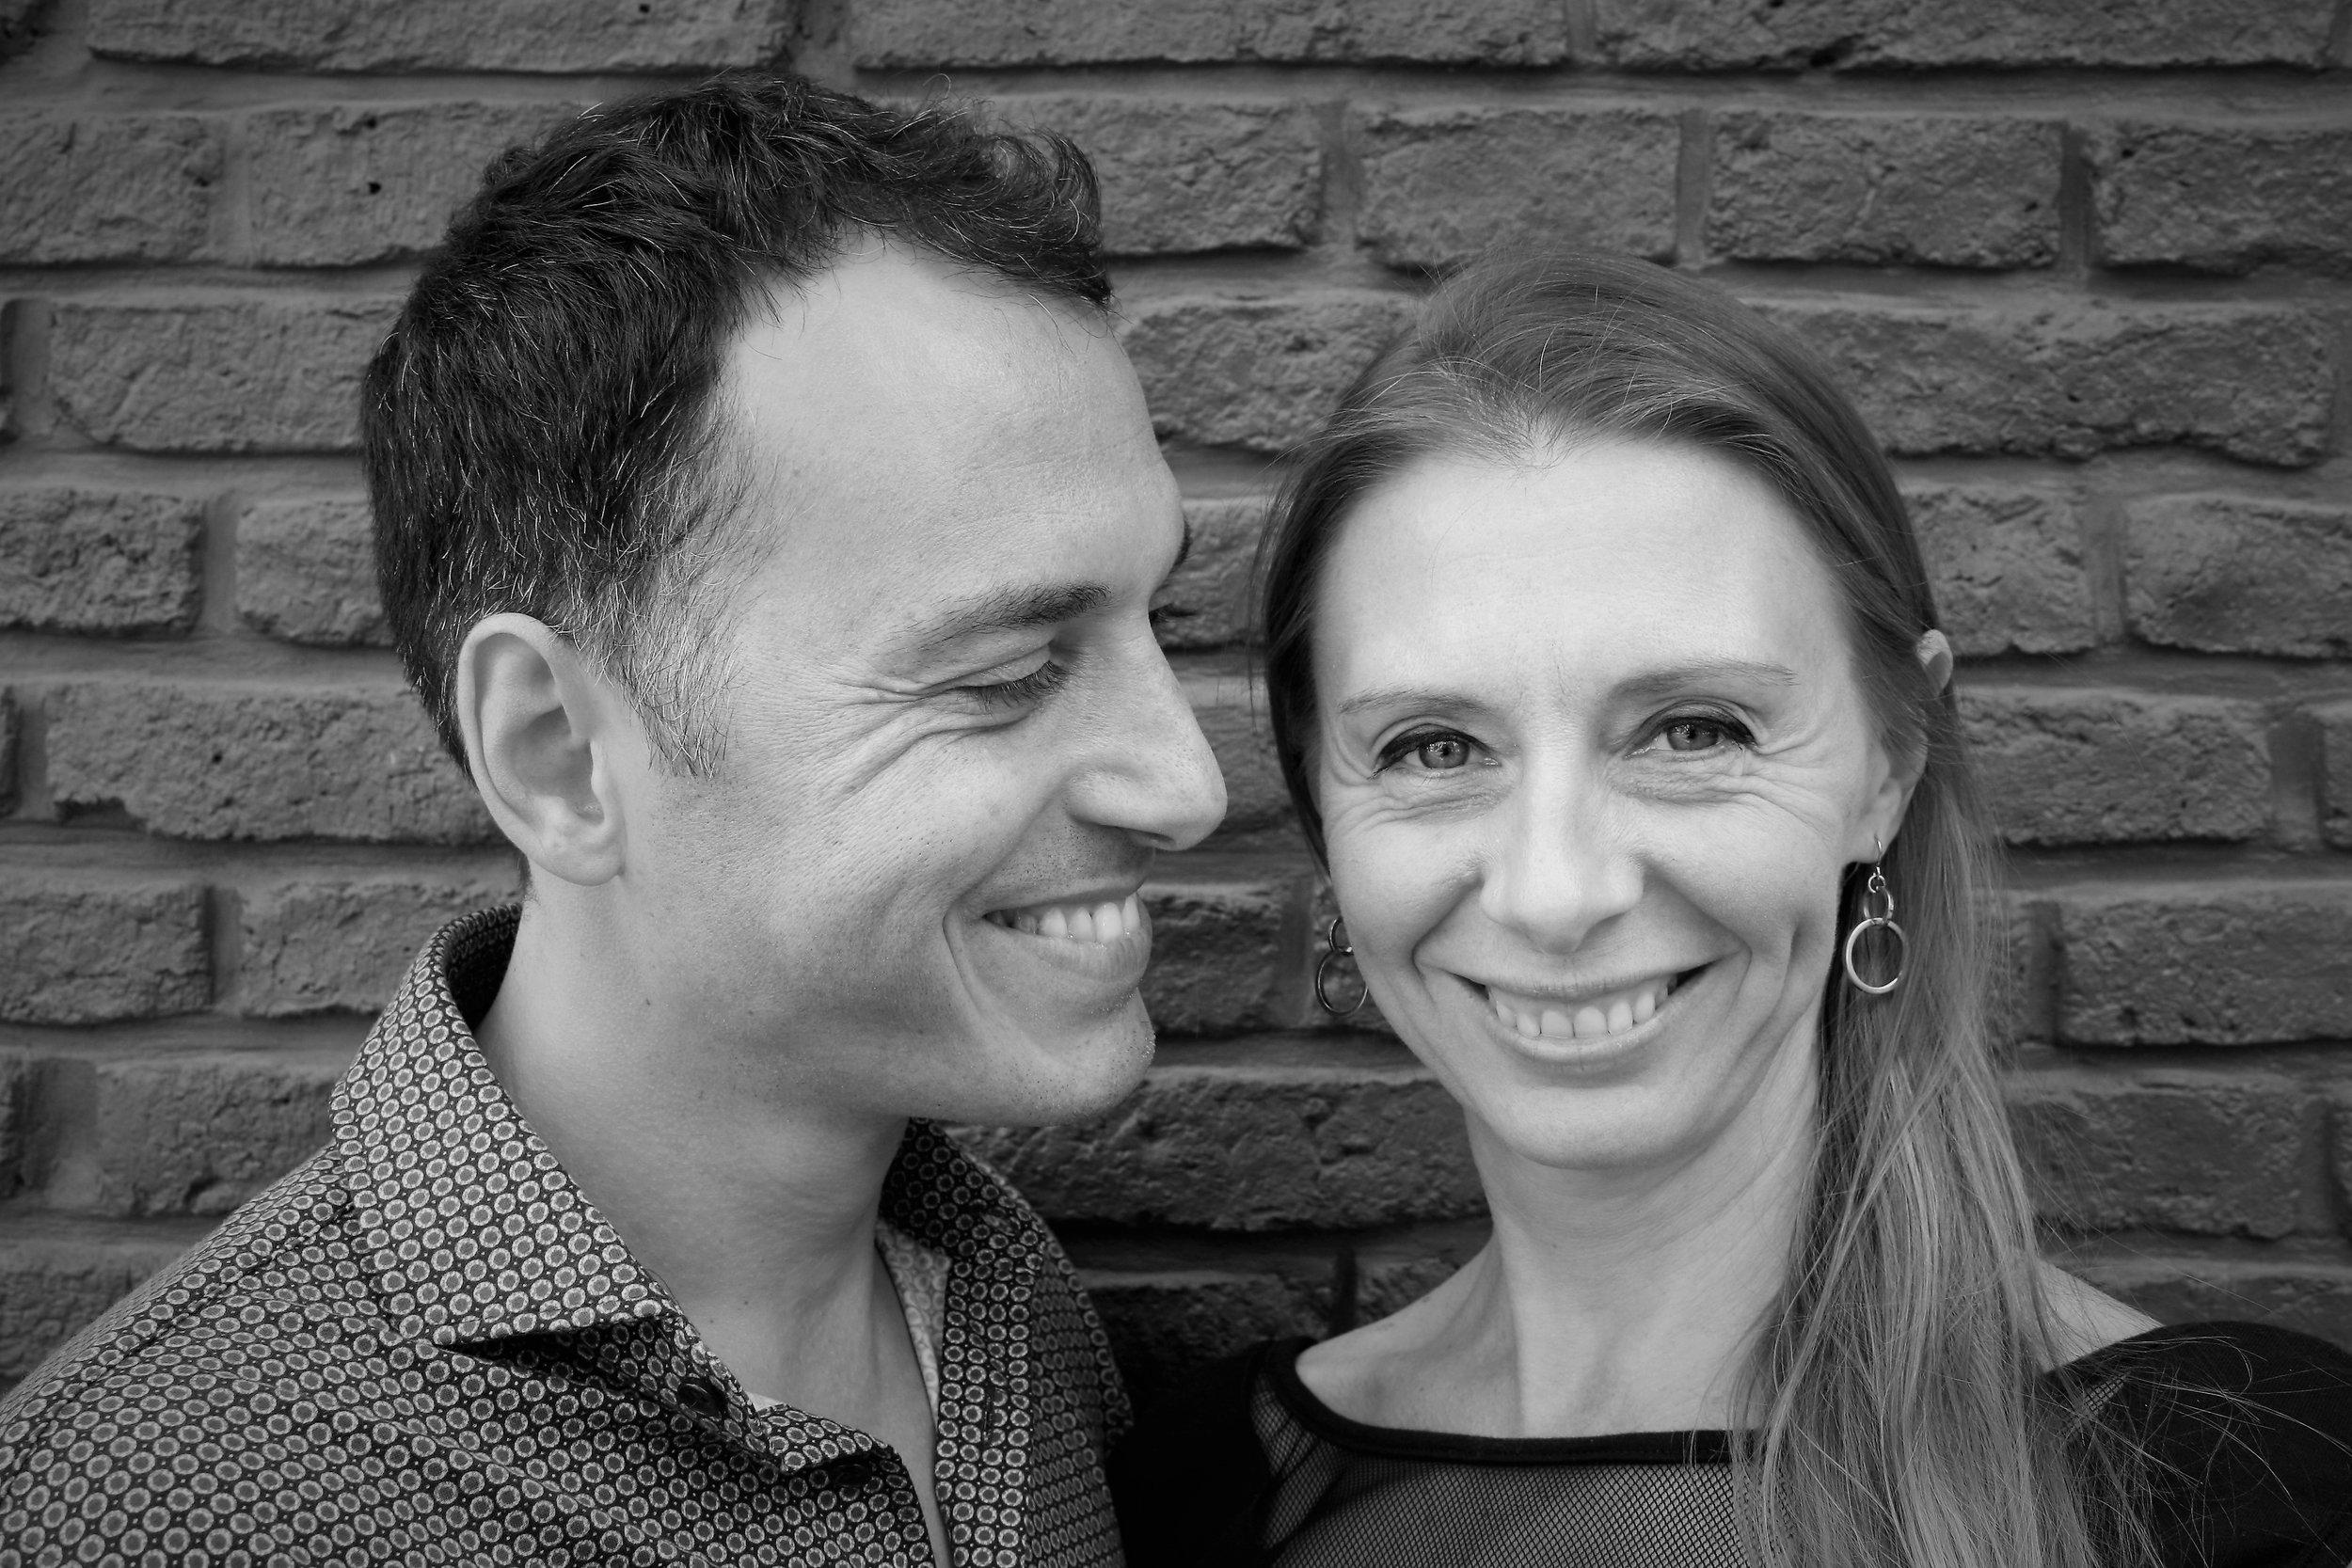 - Martin Labruna & Andrea Bestvater